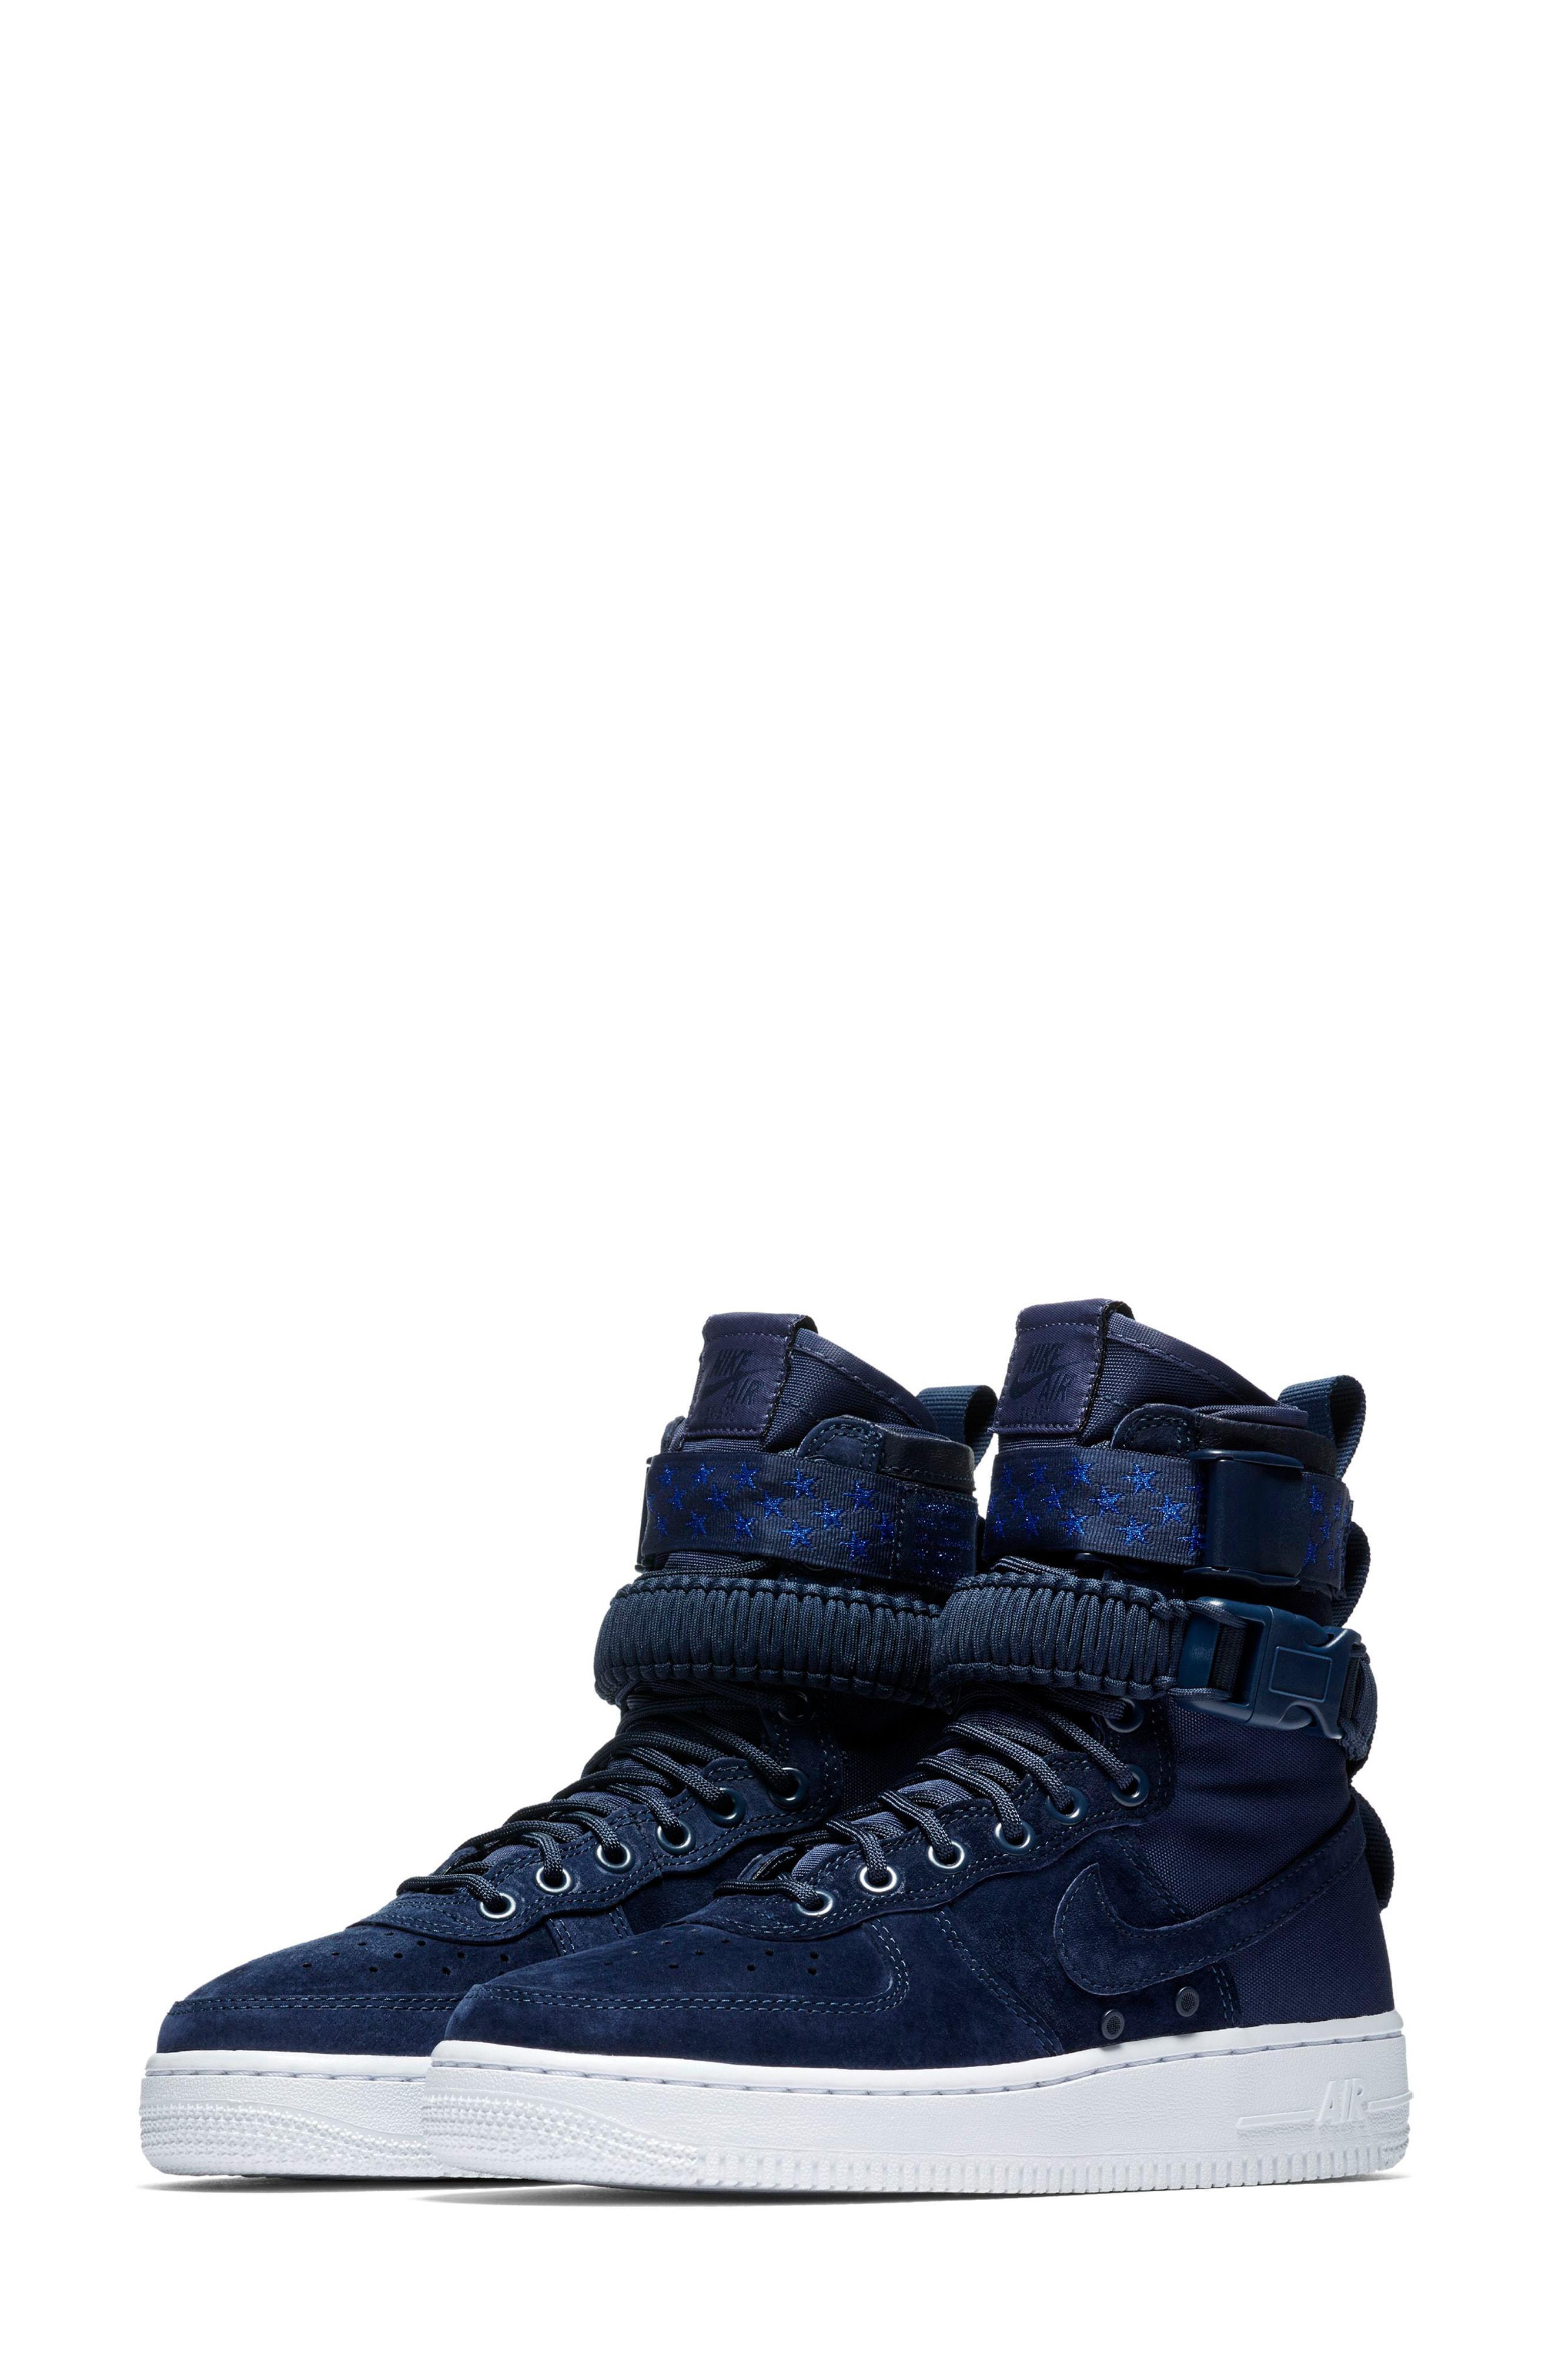 Lyst - Nike Sf Air Force 1 High Top Sneaker in Blue 749c3c057